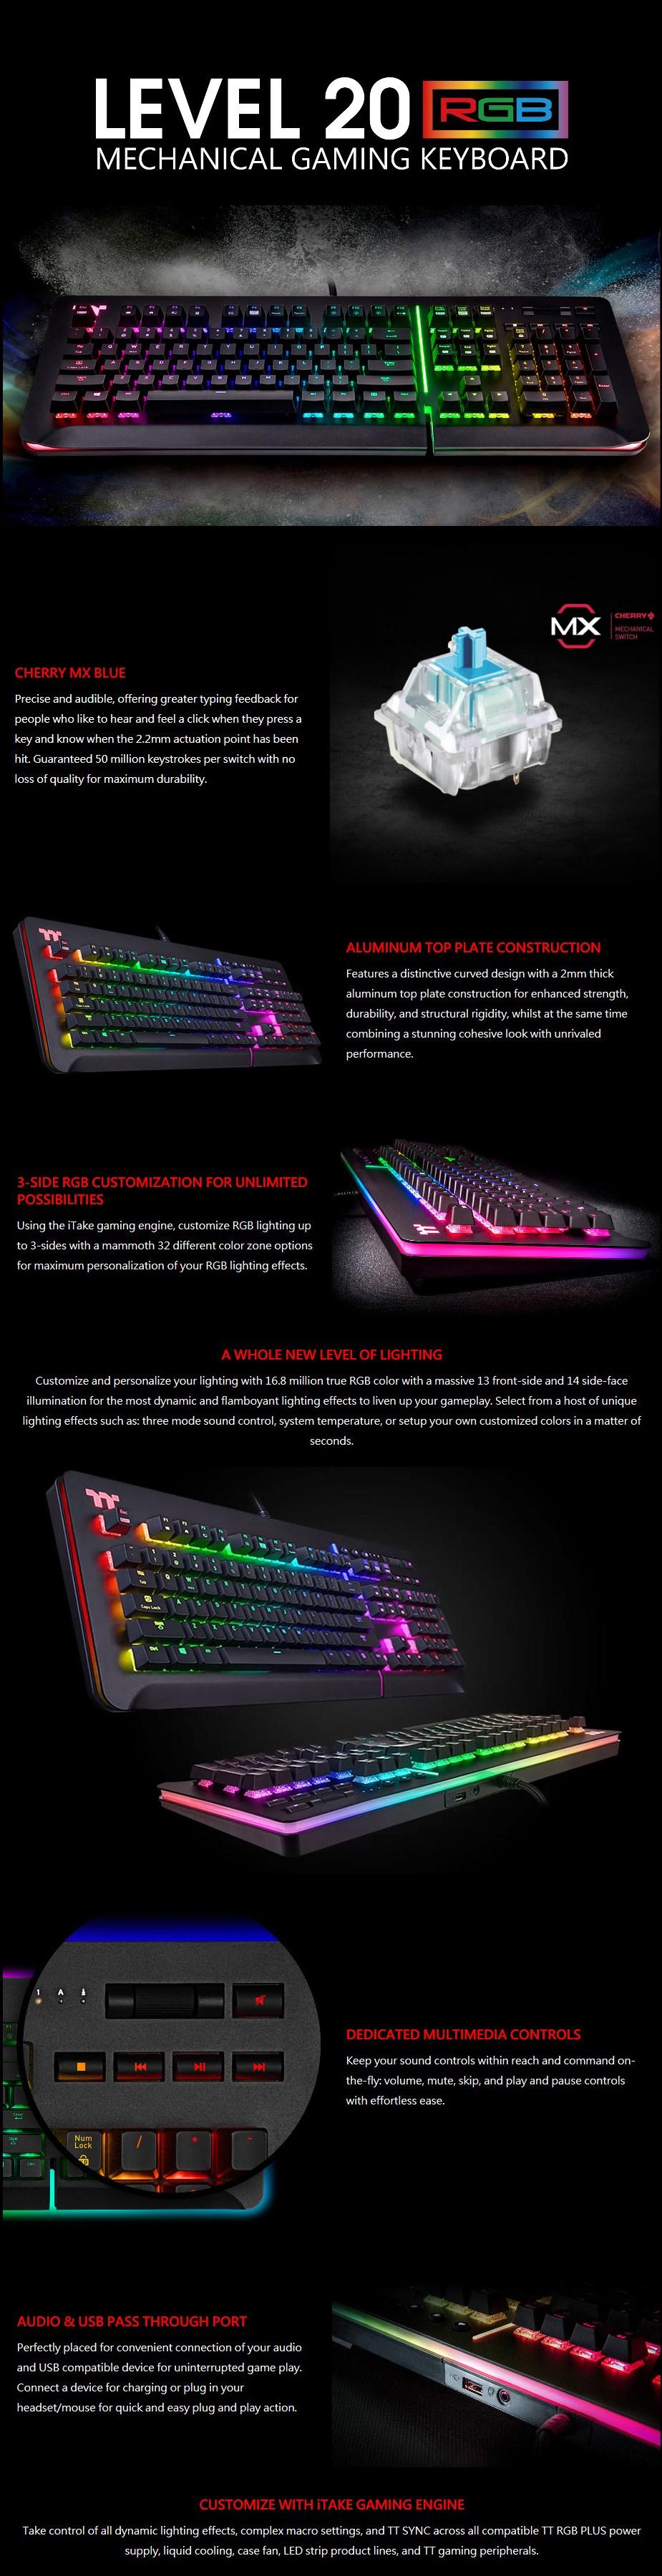 Thermaltake Level 20 RGB Mechanical Gaming Keyboard - Cherry MX Blue - Desktop Overview 1